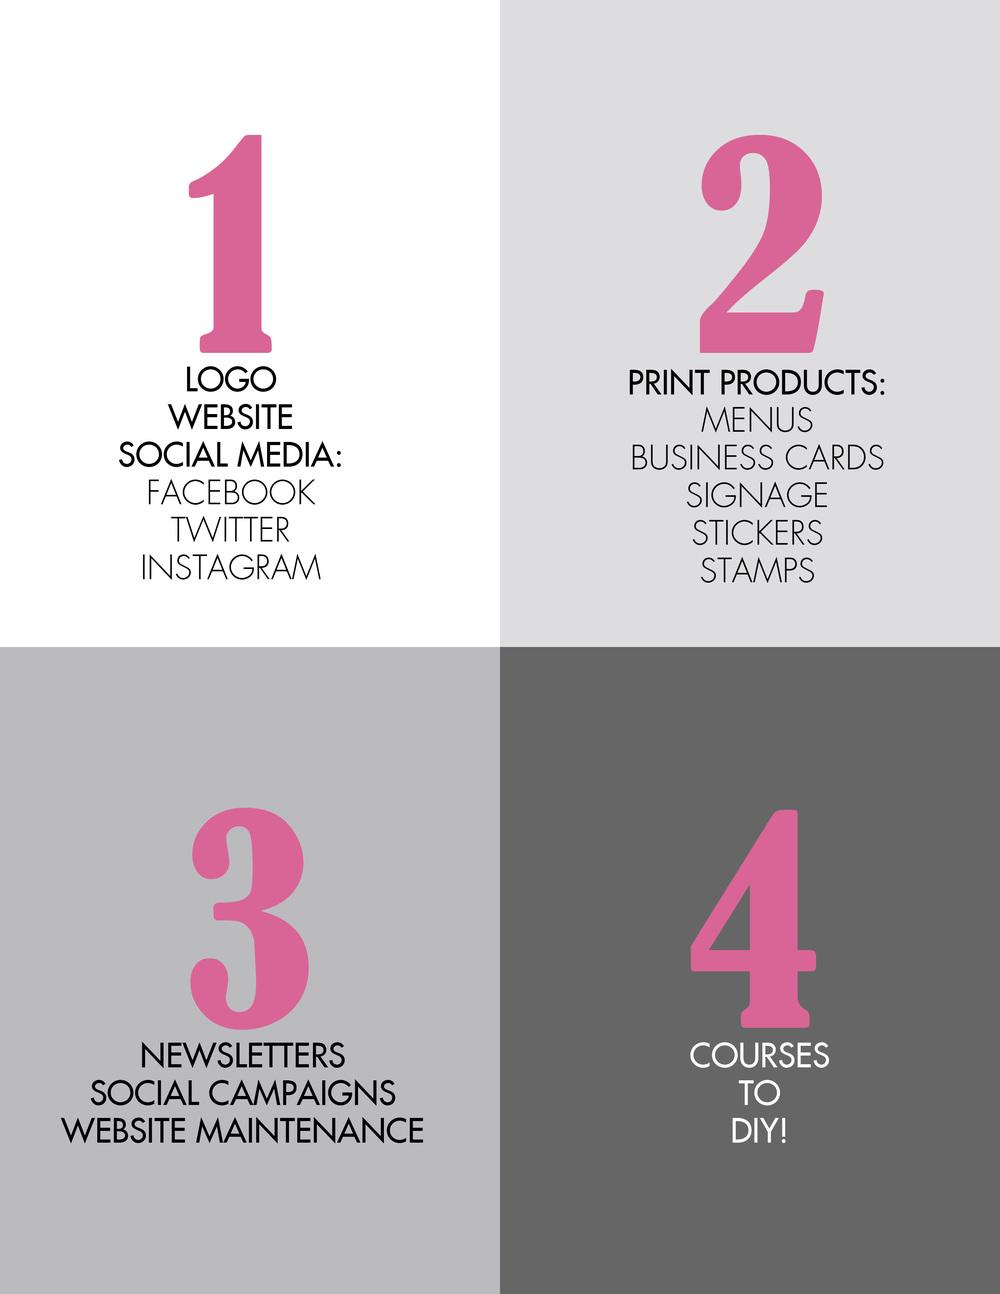 FOUR STEPS TO SUCCESS!